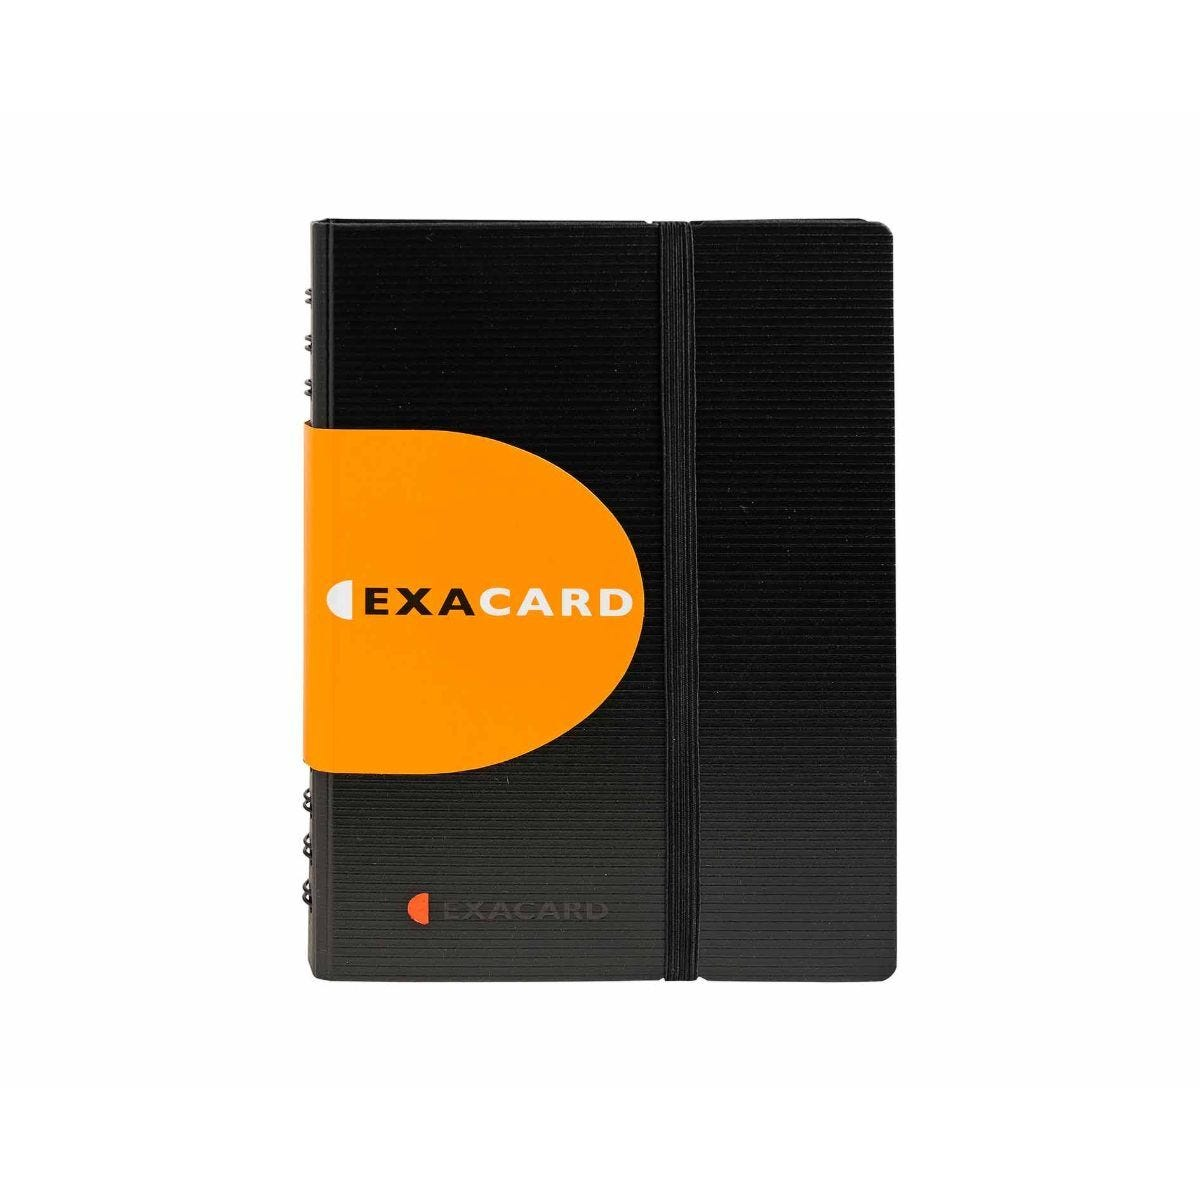 Exacompta Exacard Business Card Holder Pack of 5 Black